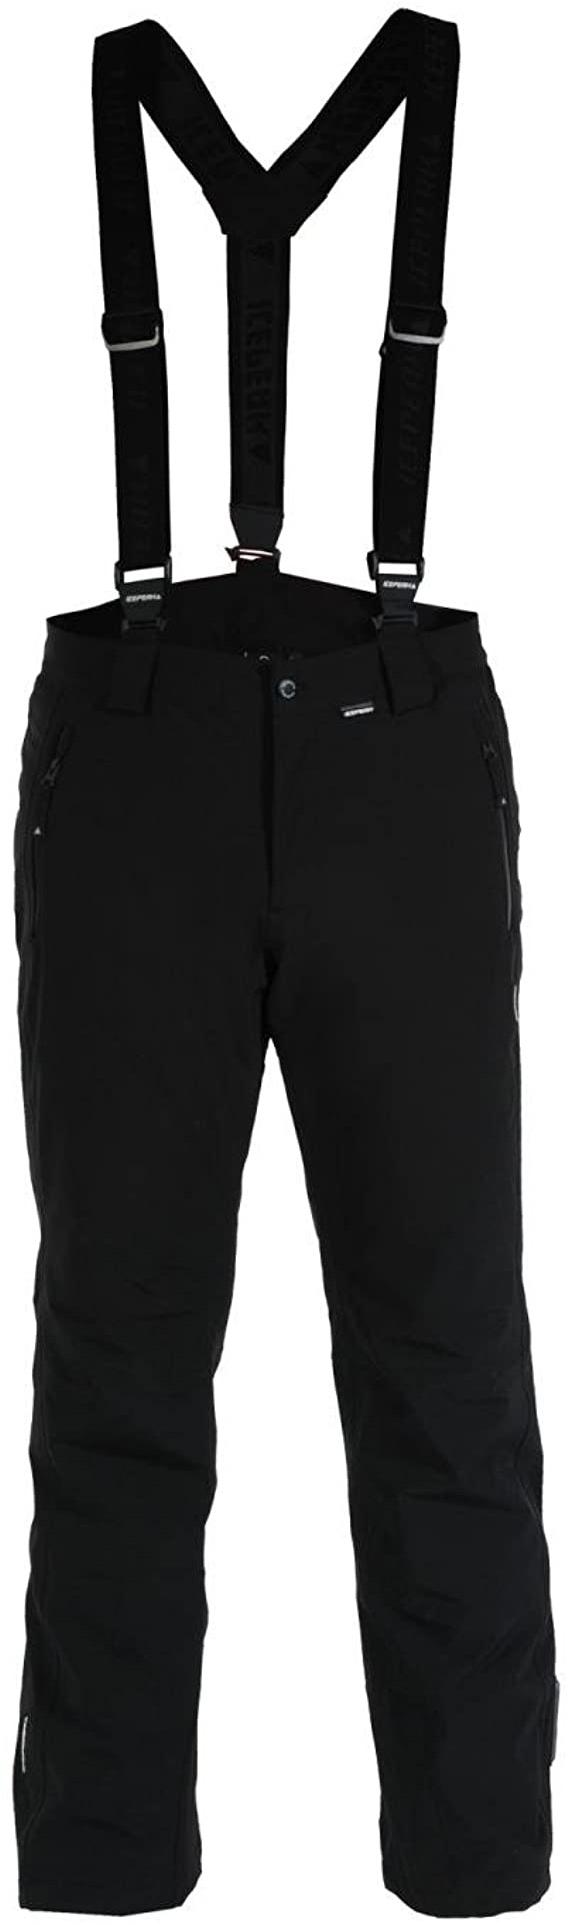 Pánské lyžařské kalhoty Icepeak Noxos IL Ski Trousers